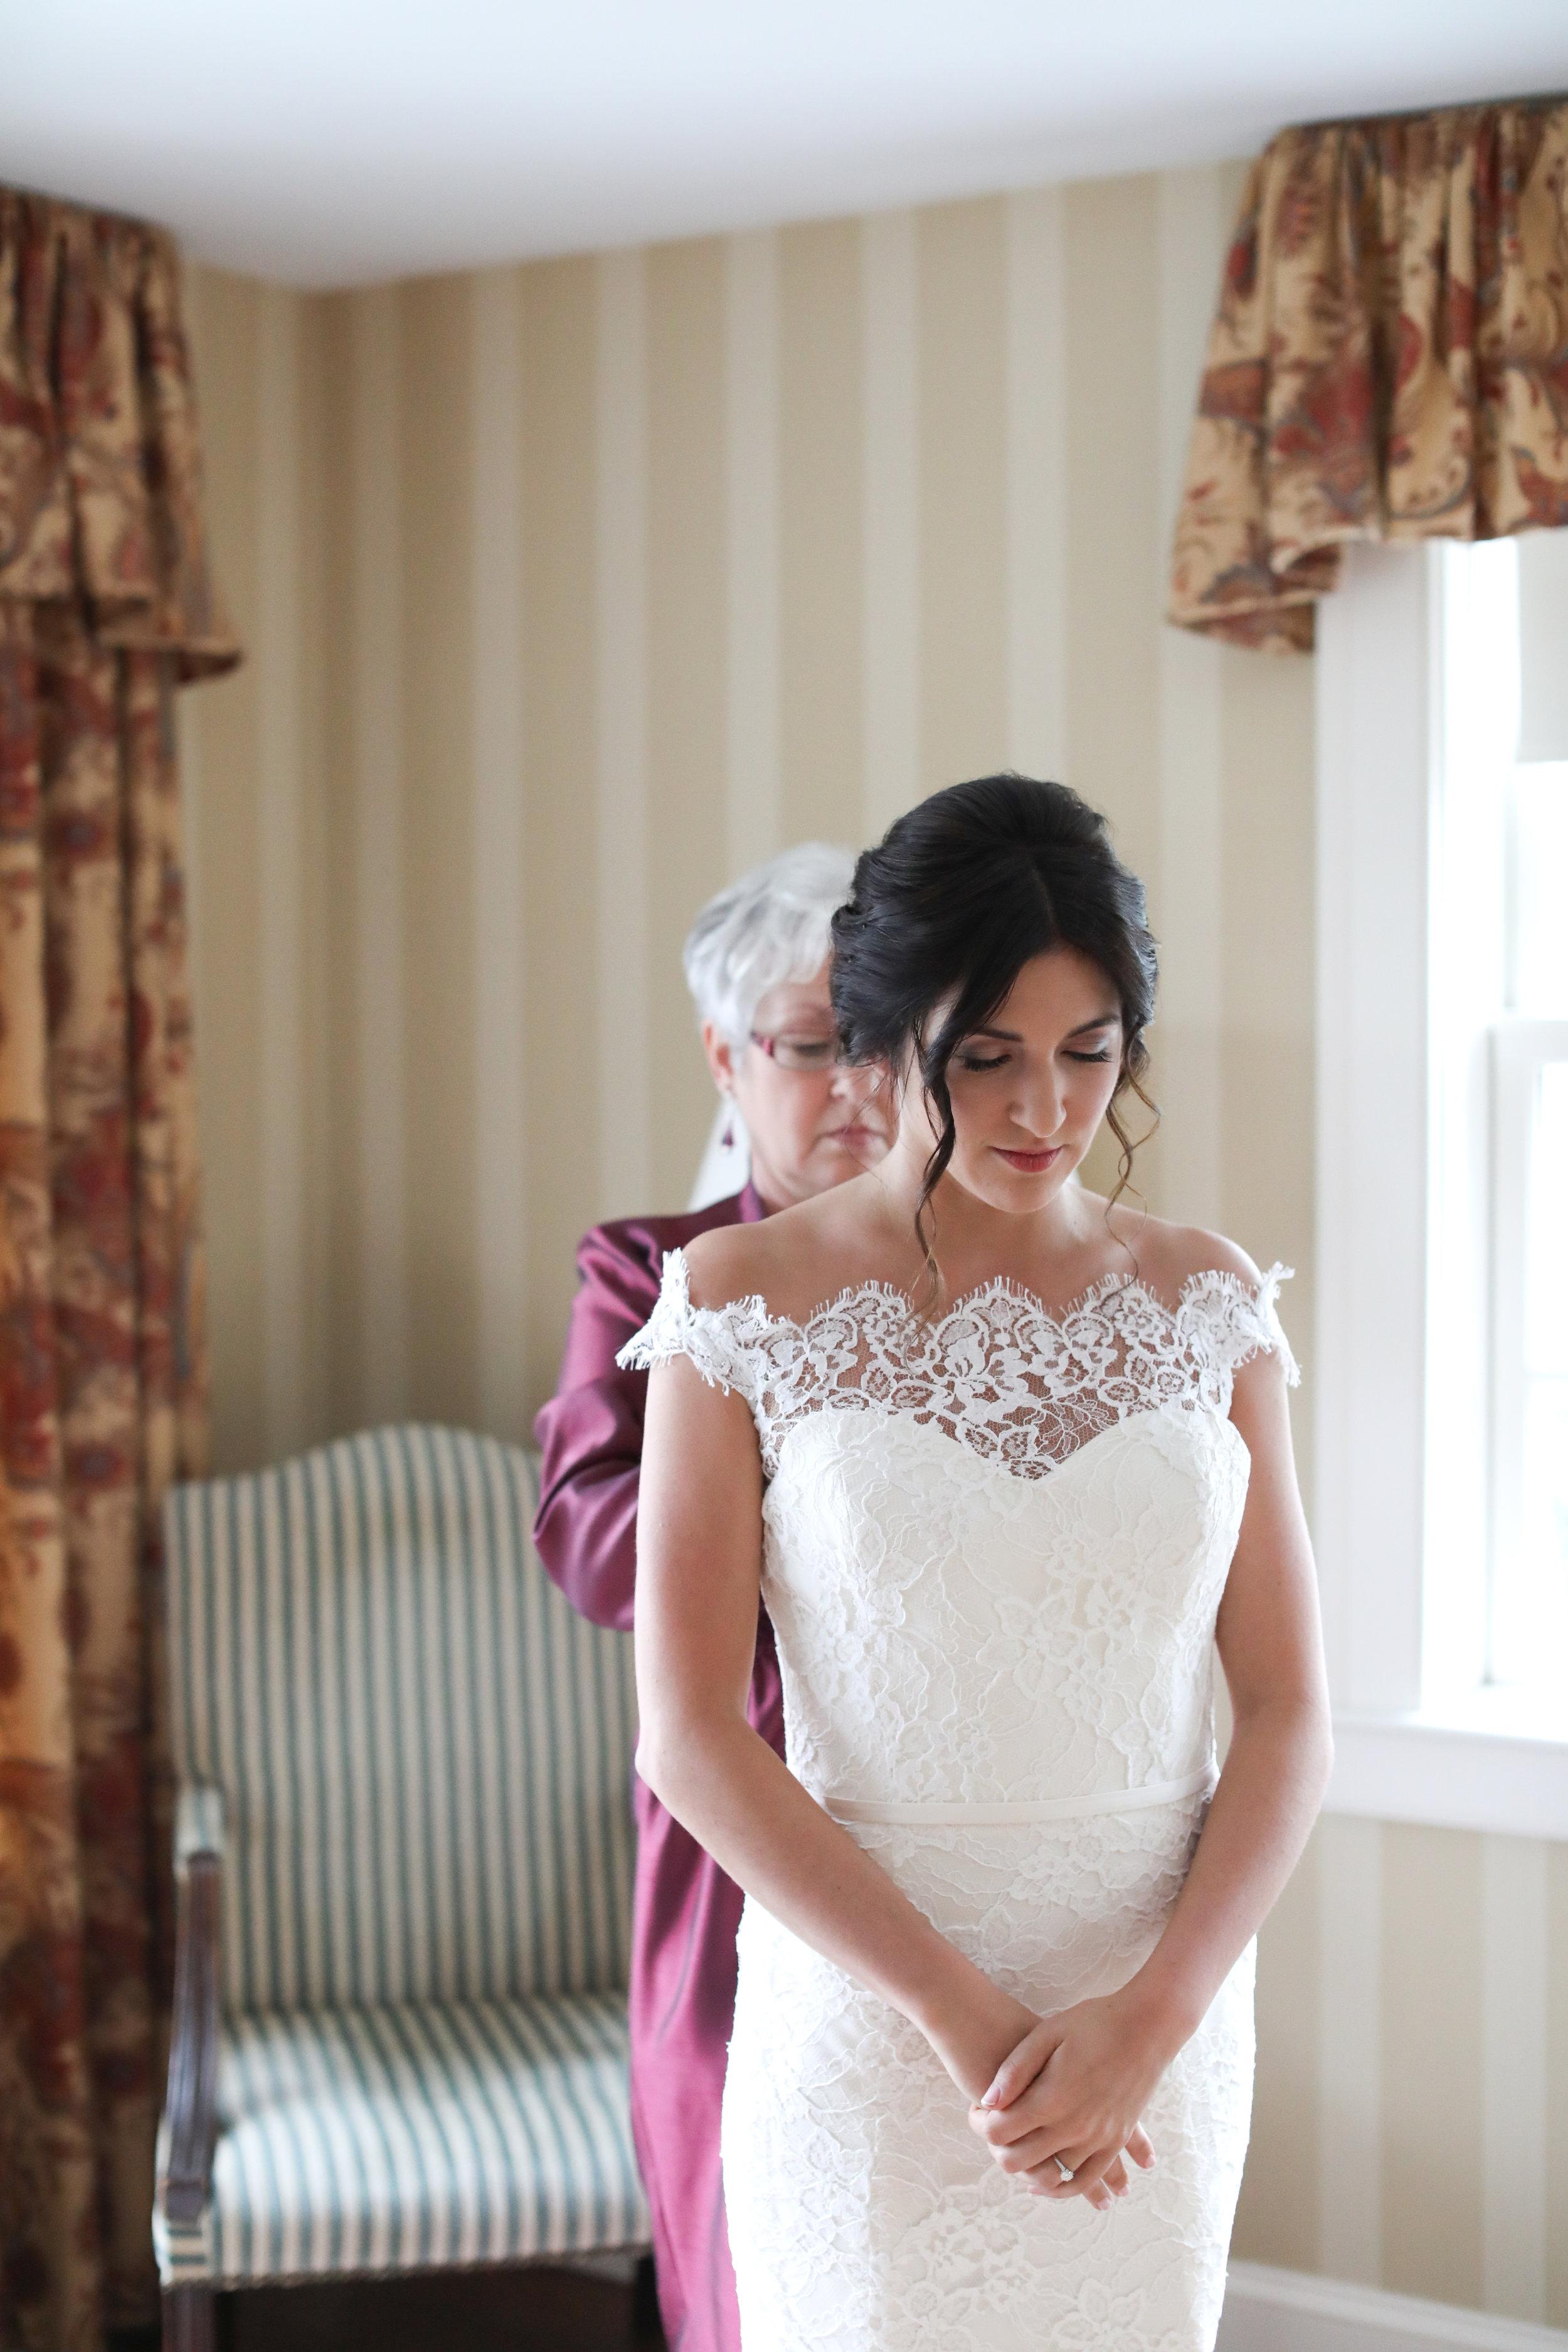 Lace Factory Wedding CT Wedding Planner - 16.jpg